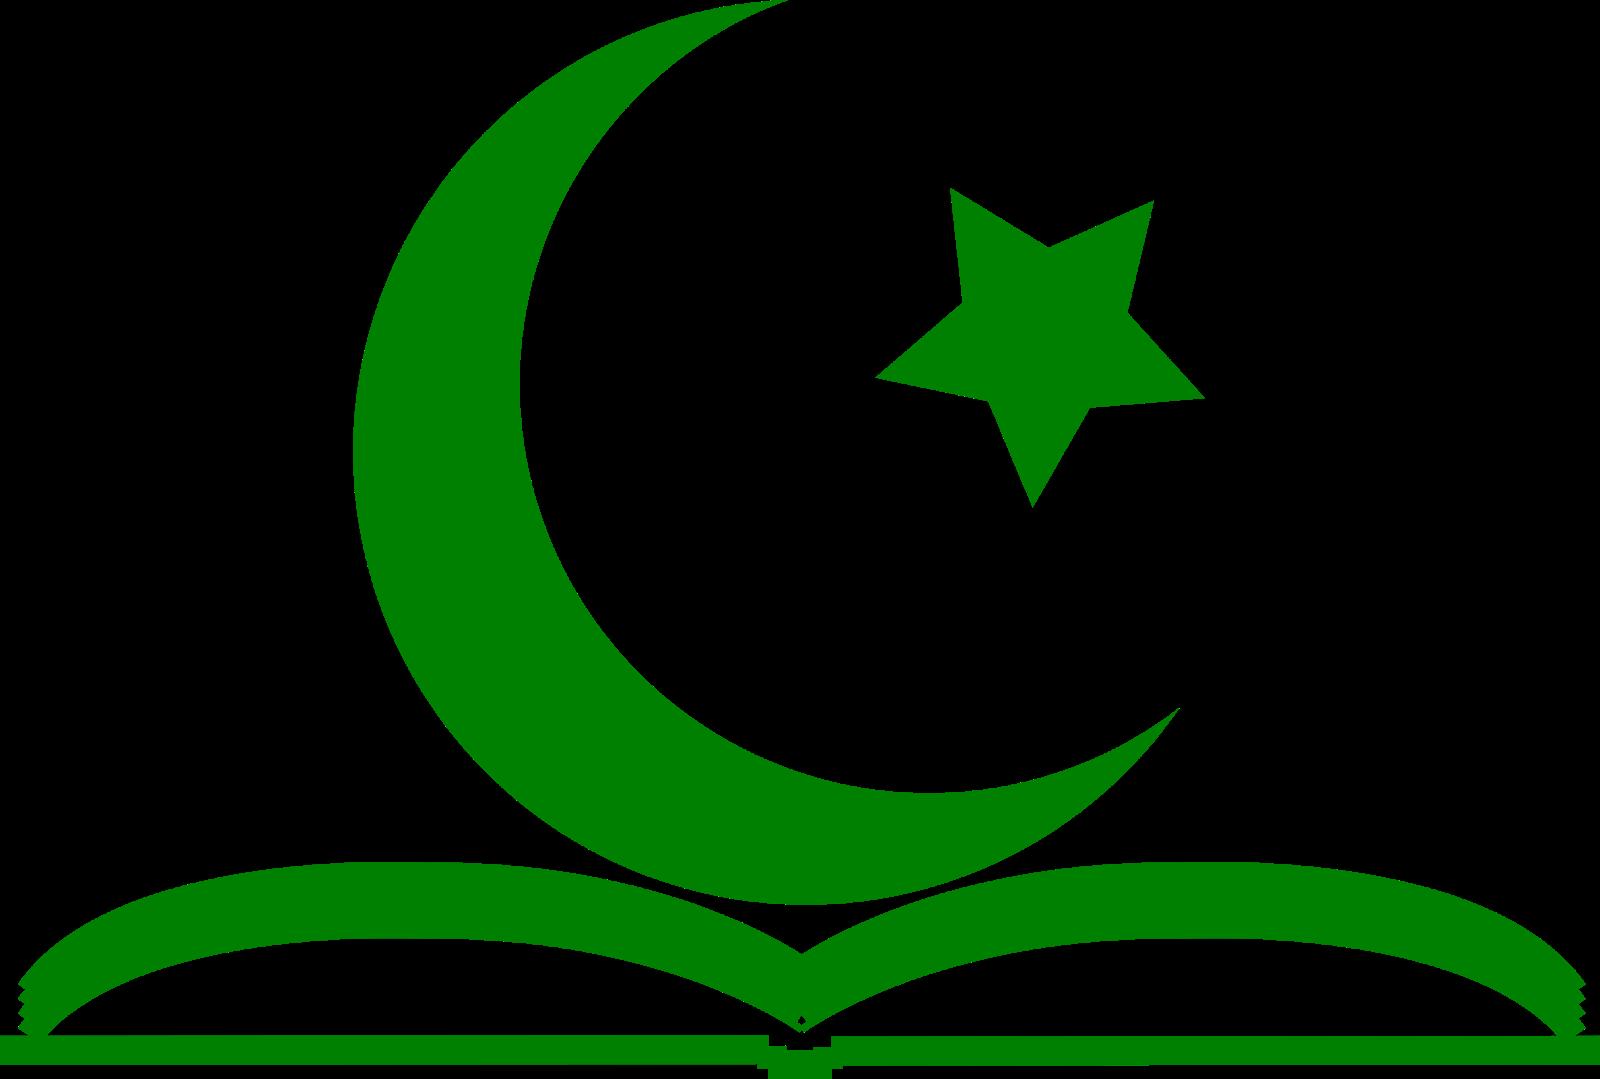 kontak ulumul islamiyah